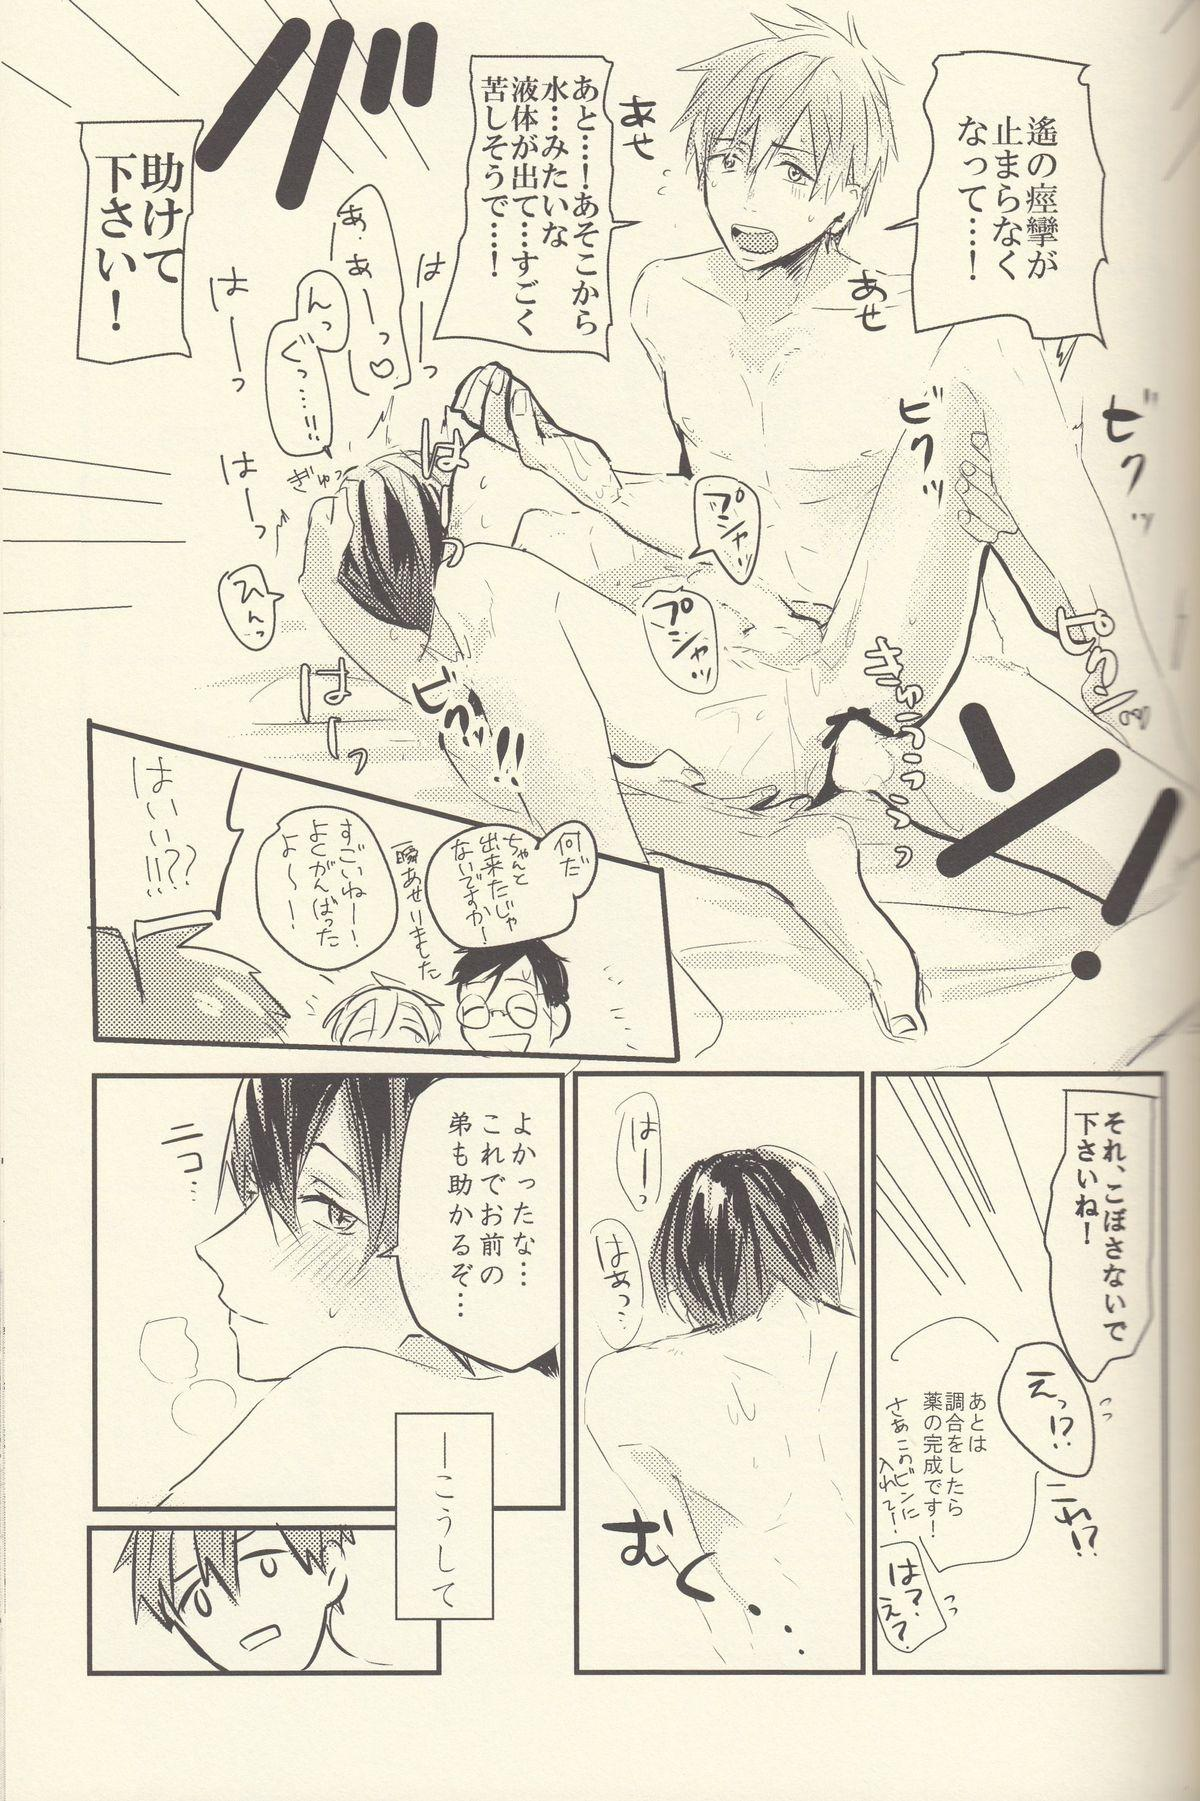 Shiofuki no Friendship - Makoto ♥ Haruka Squirting Anthology 22